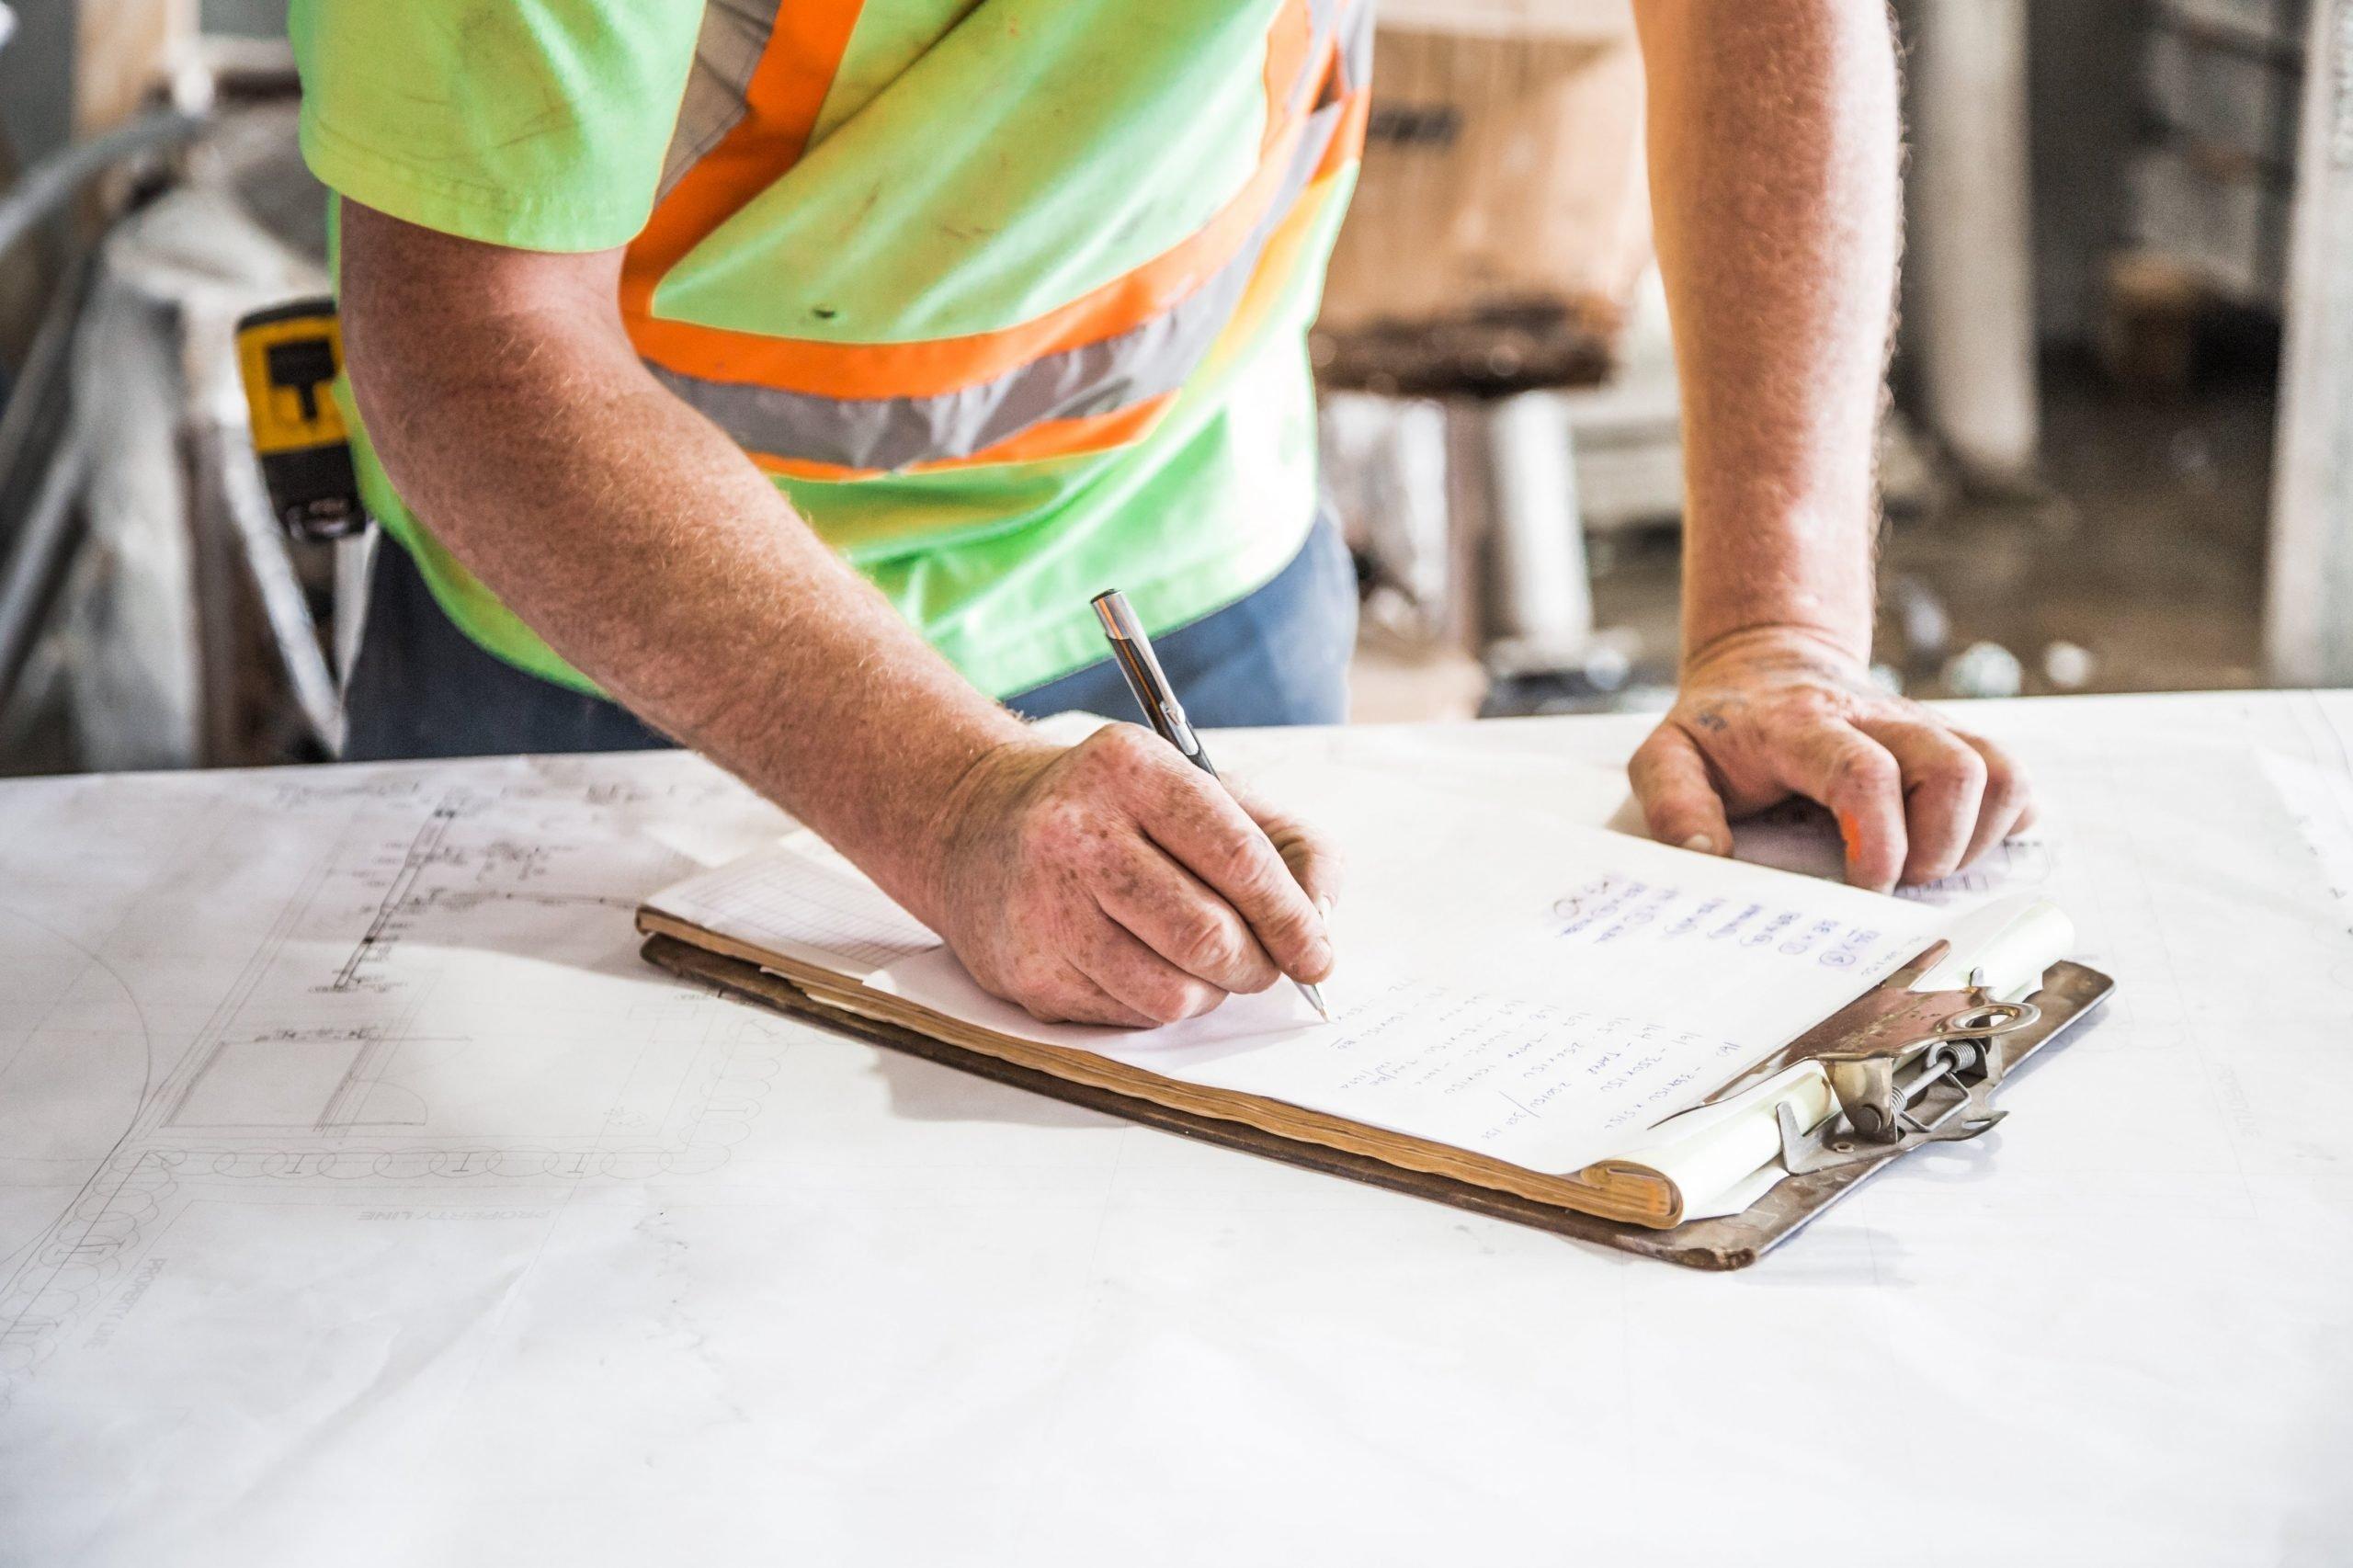 Construction man writing on a pad